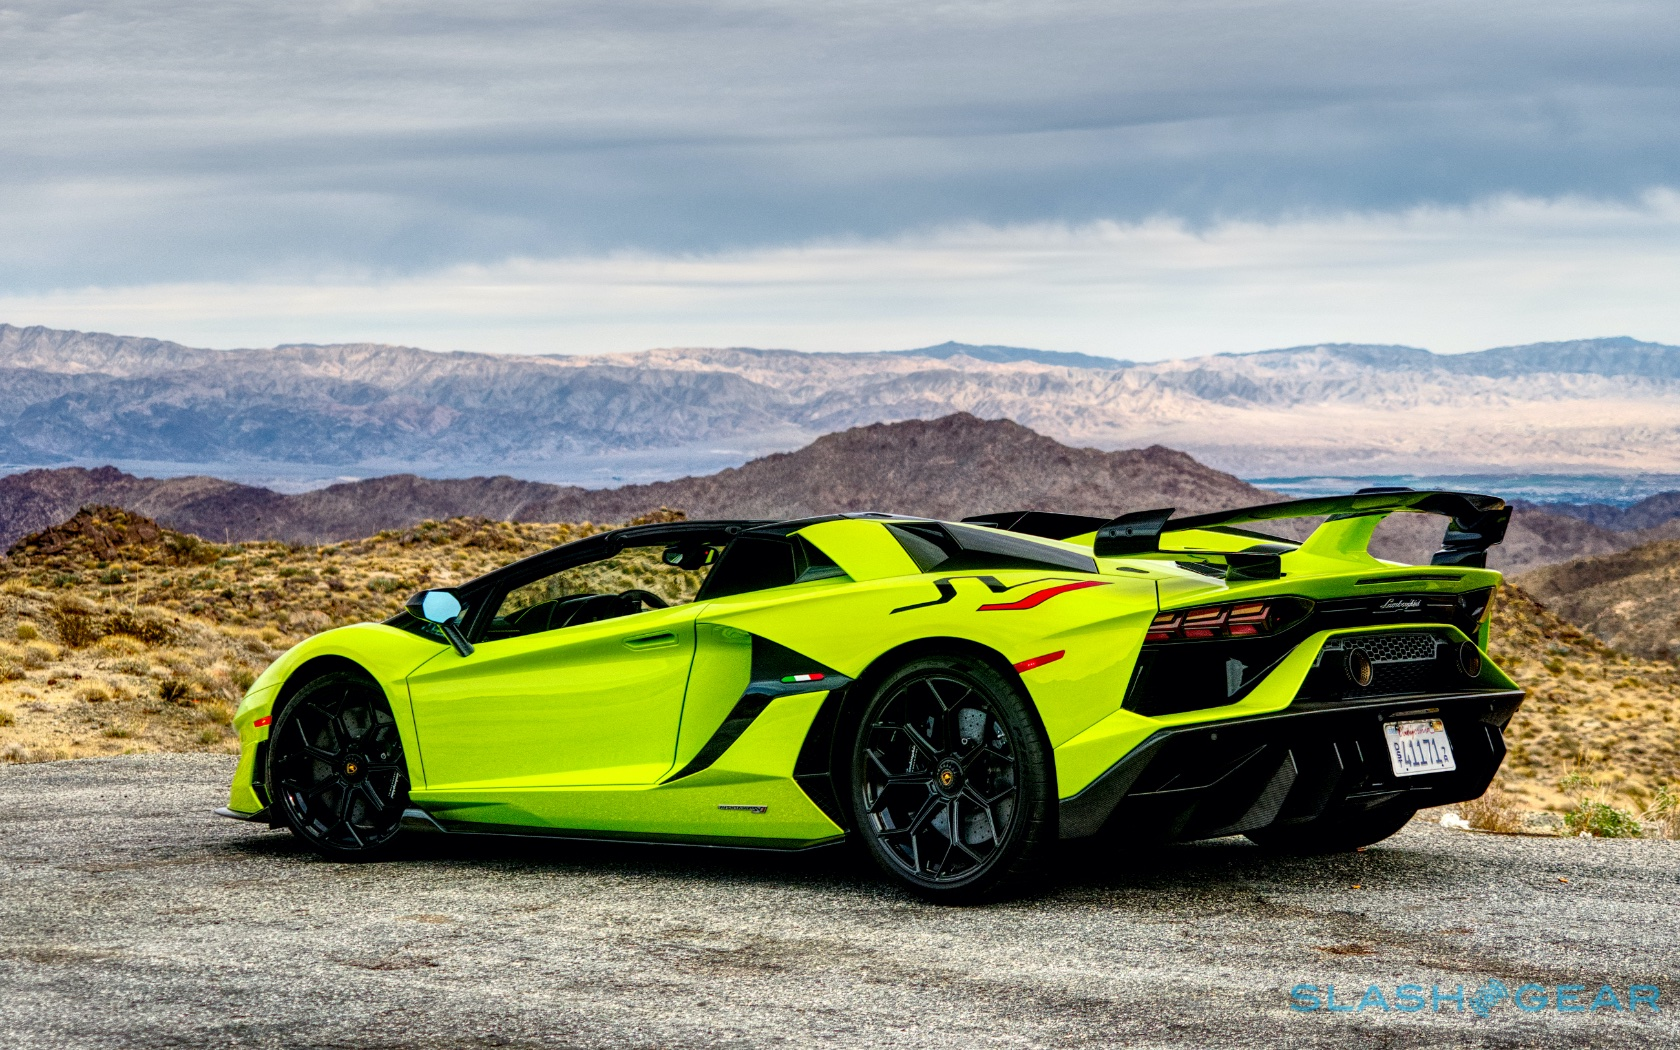 Lamborghini Aventador Svj Roadster First Drive Era Defining